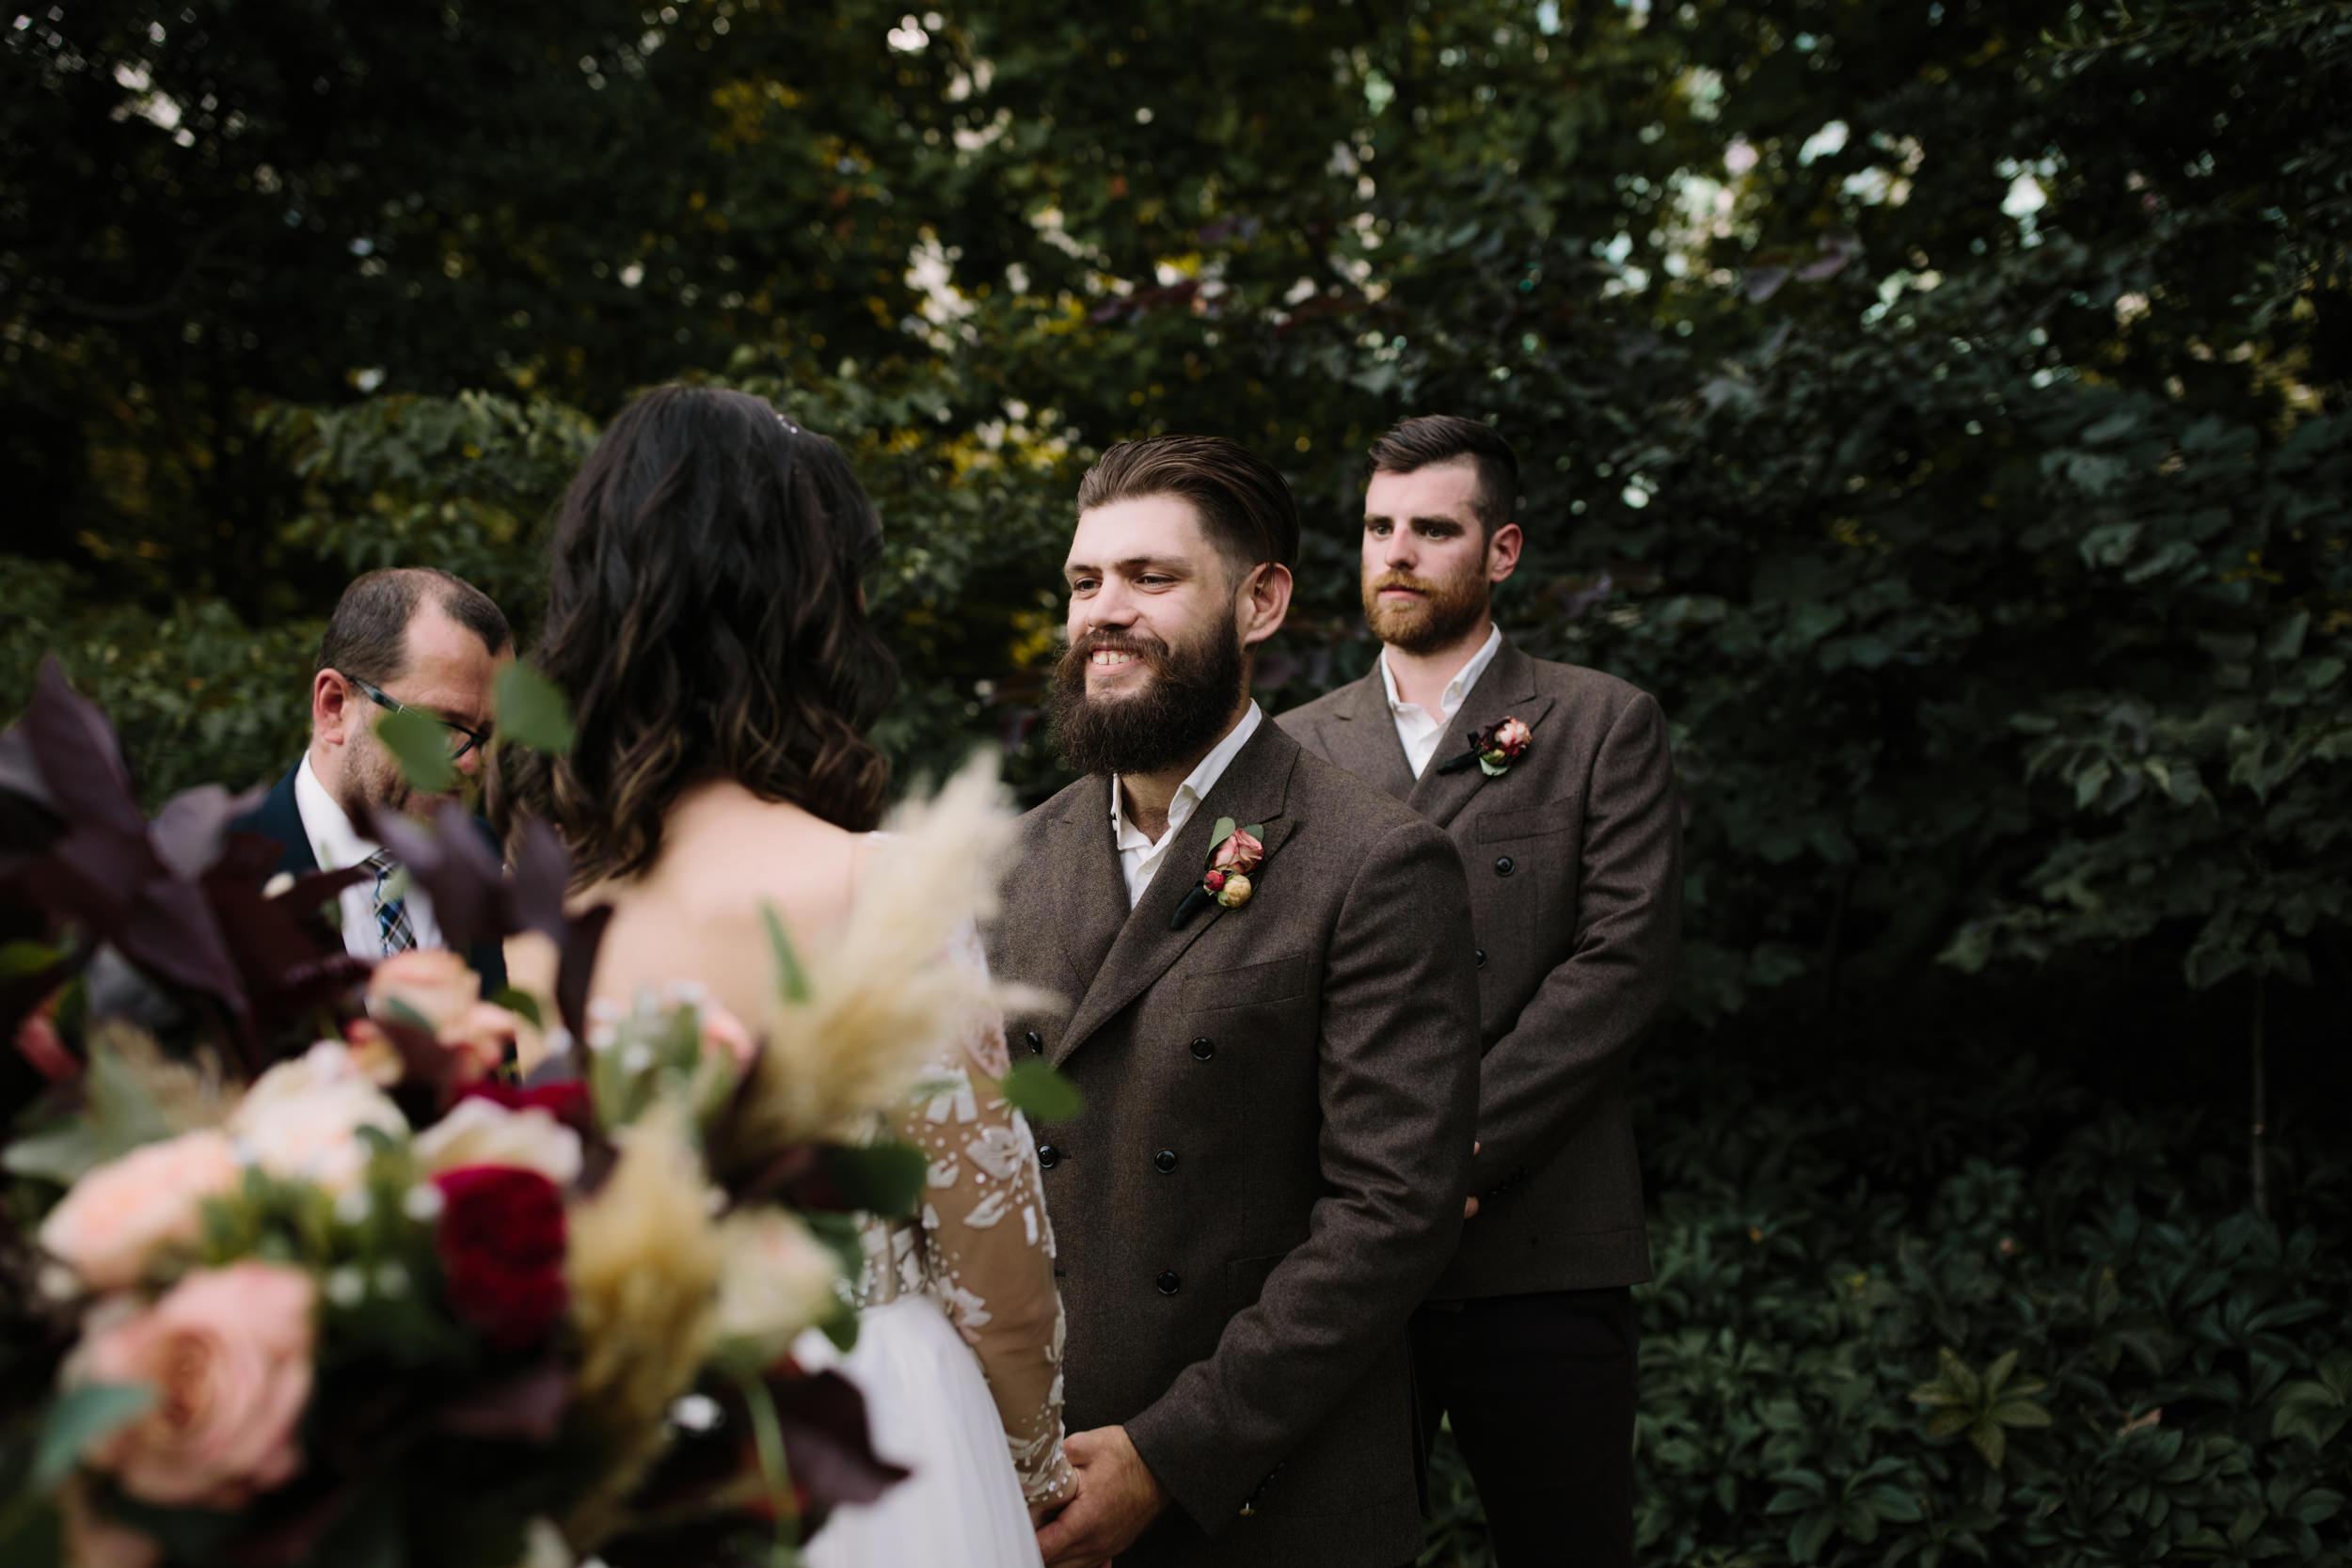 I-Got-You-Babe-Weddings-Hayley-Sam-NGV-Melbourne0060.JPG